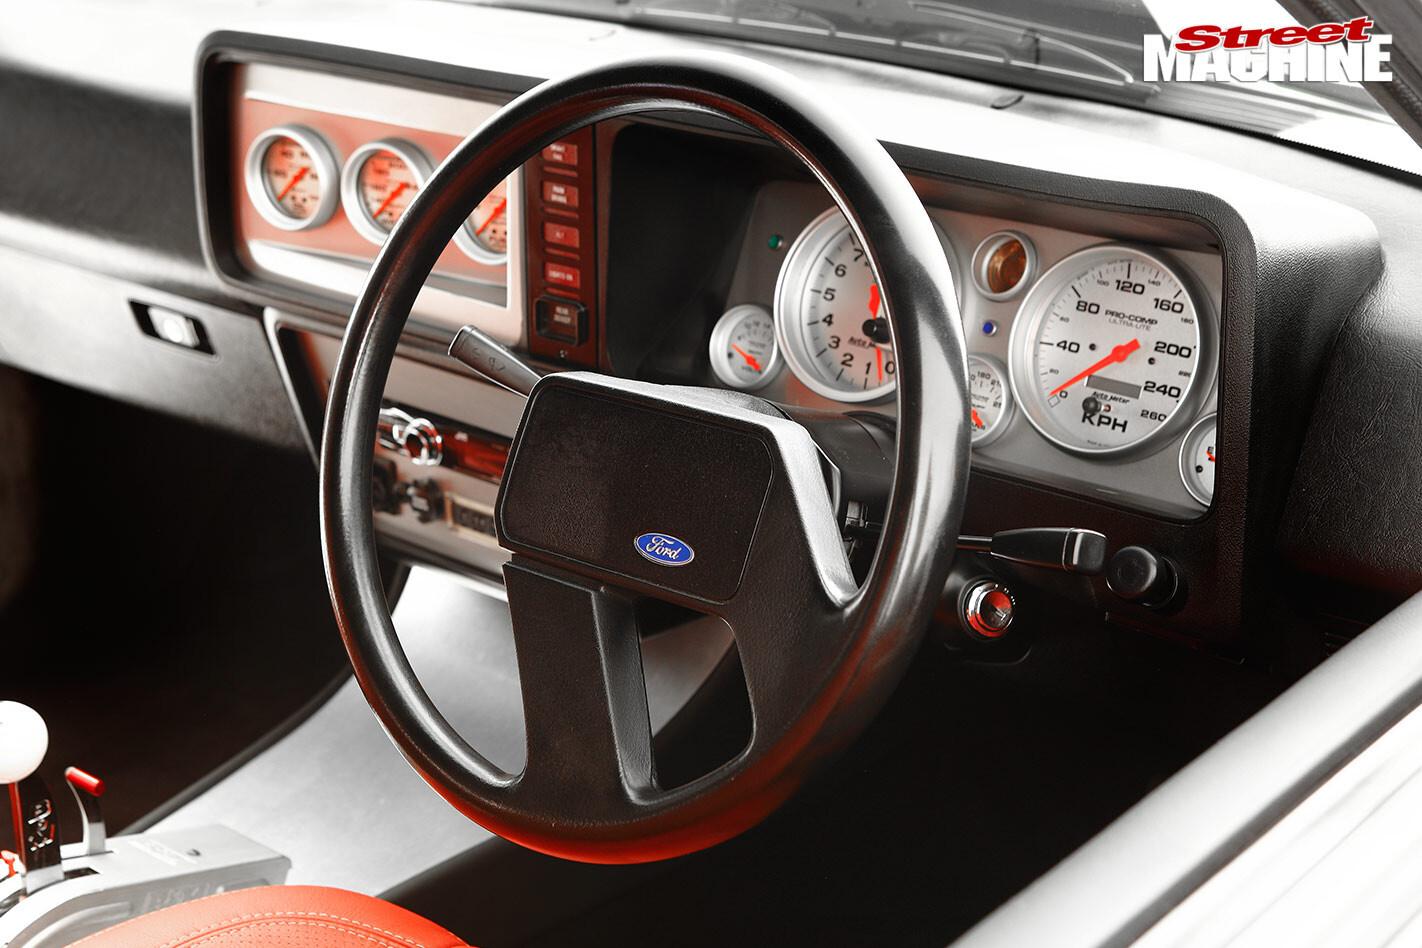 Ford Falcon XD dash